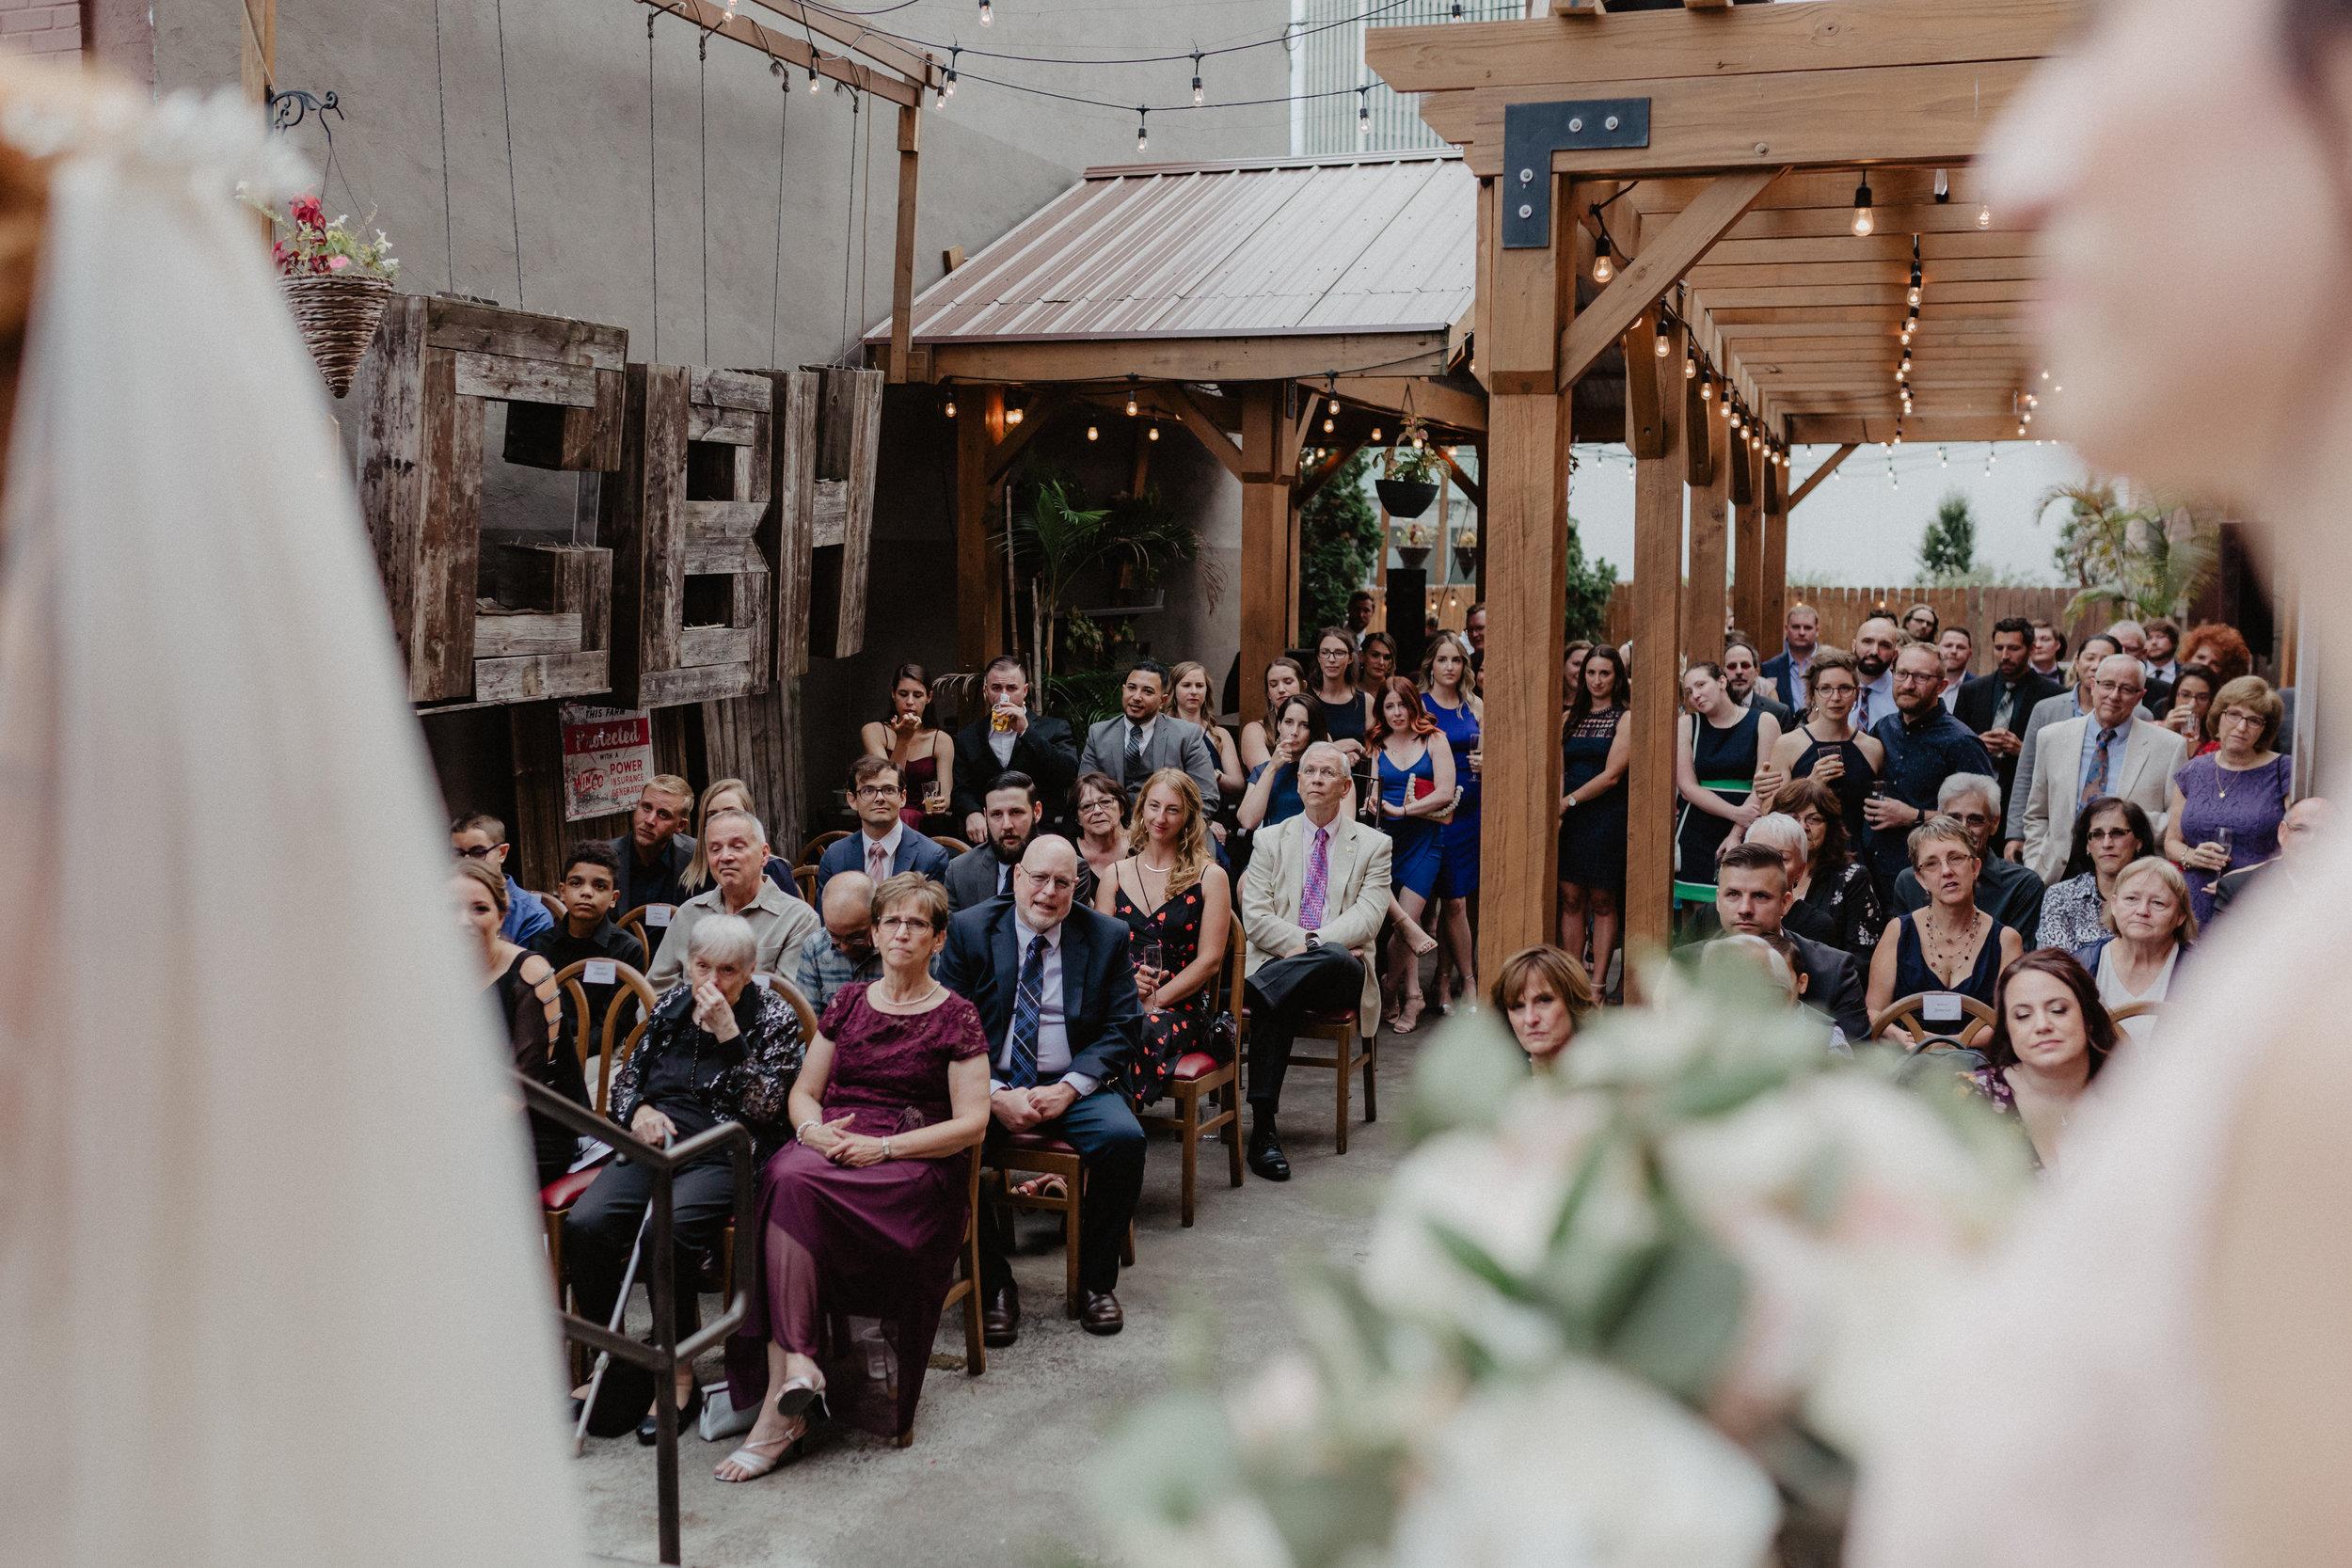 city-beer-hall-wedding-64.jpg